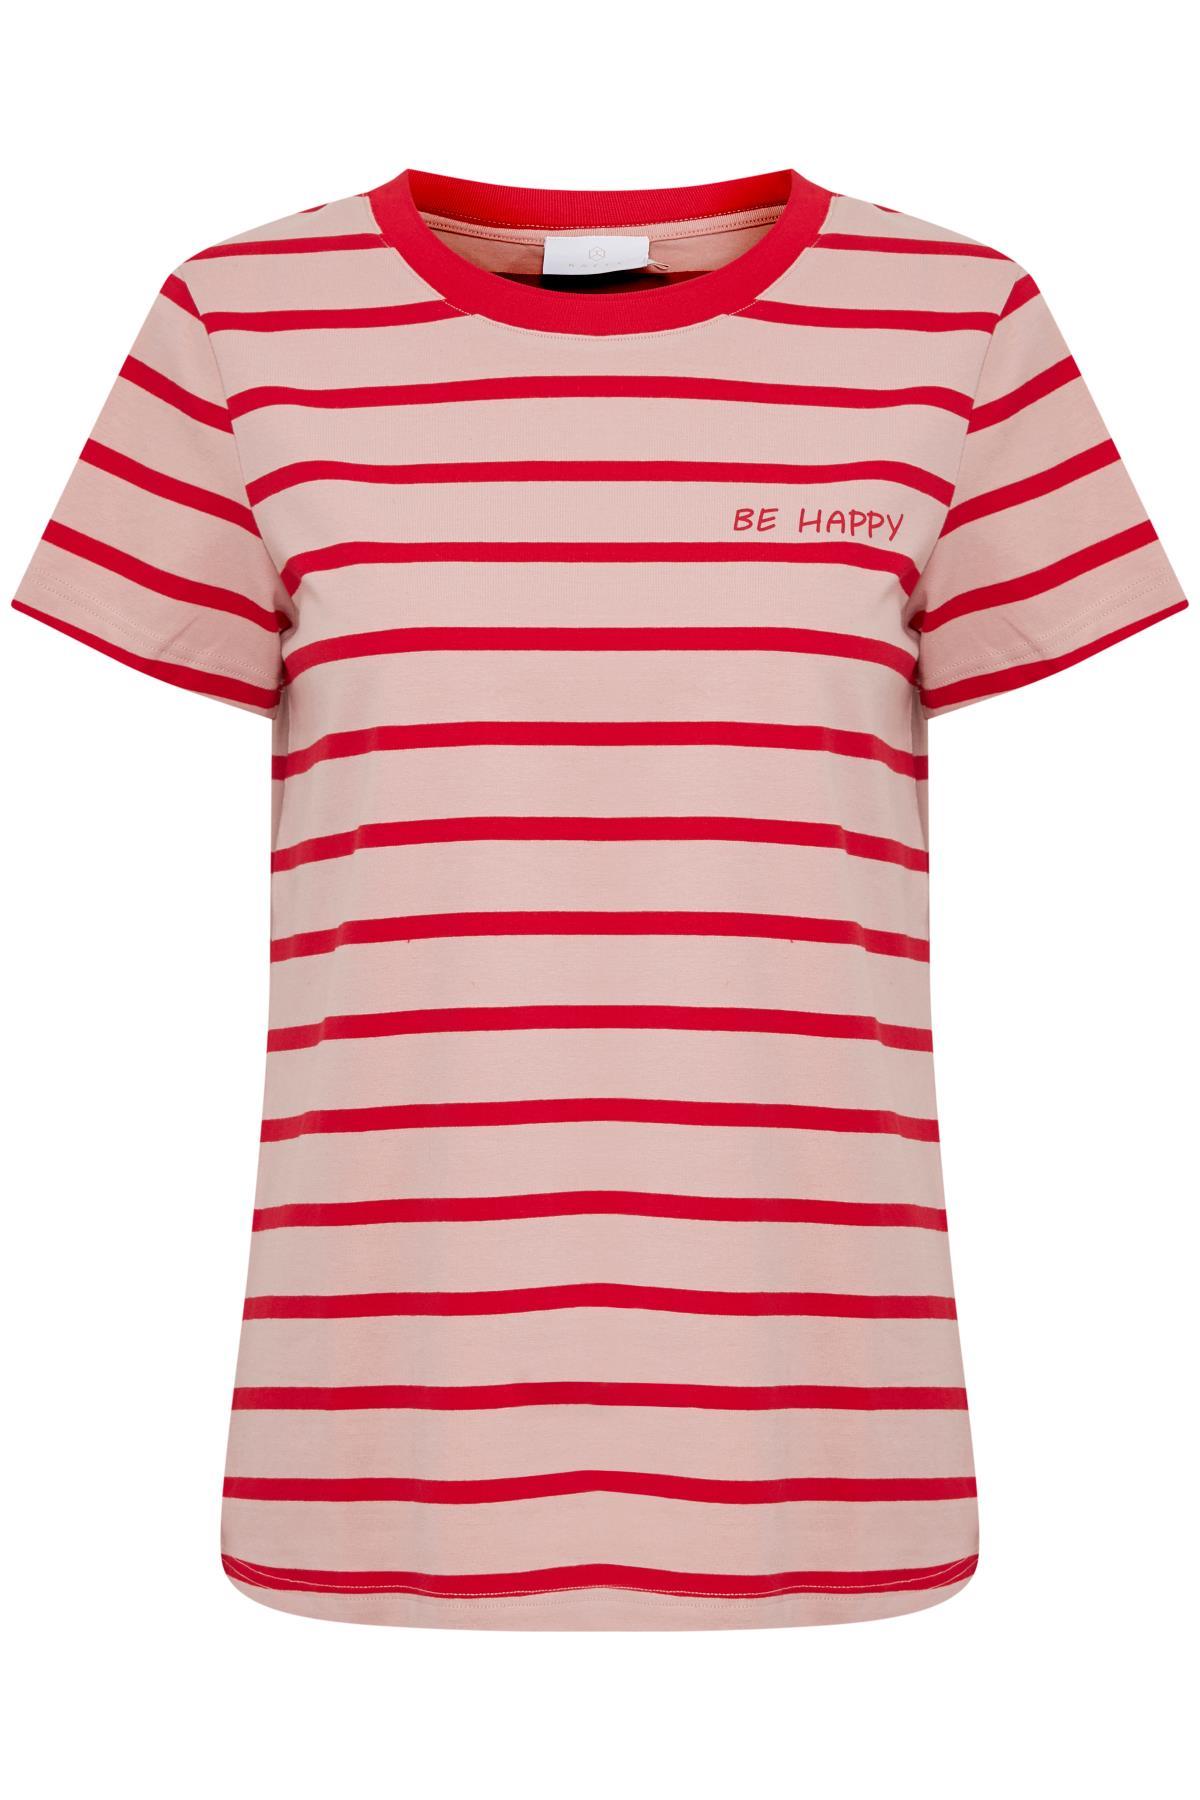 Rosa/rød Kortærmet T-shirt fra Kaffe – Køb Rosa/rød Kortærmet T-shirt fra str. XS-XXL her